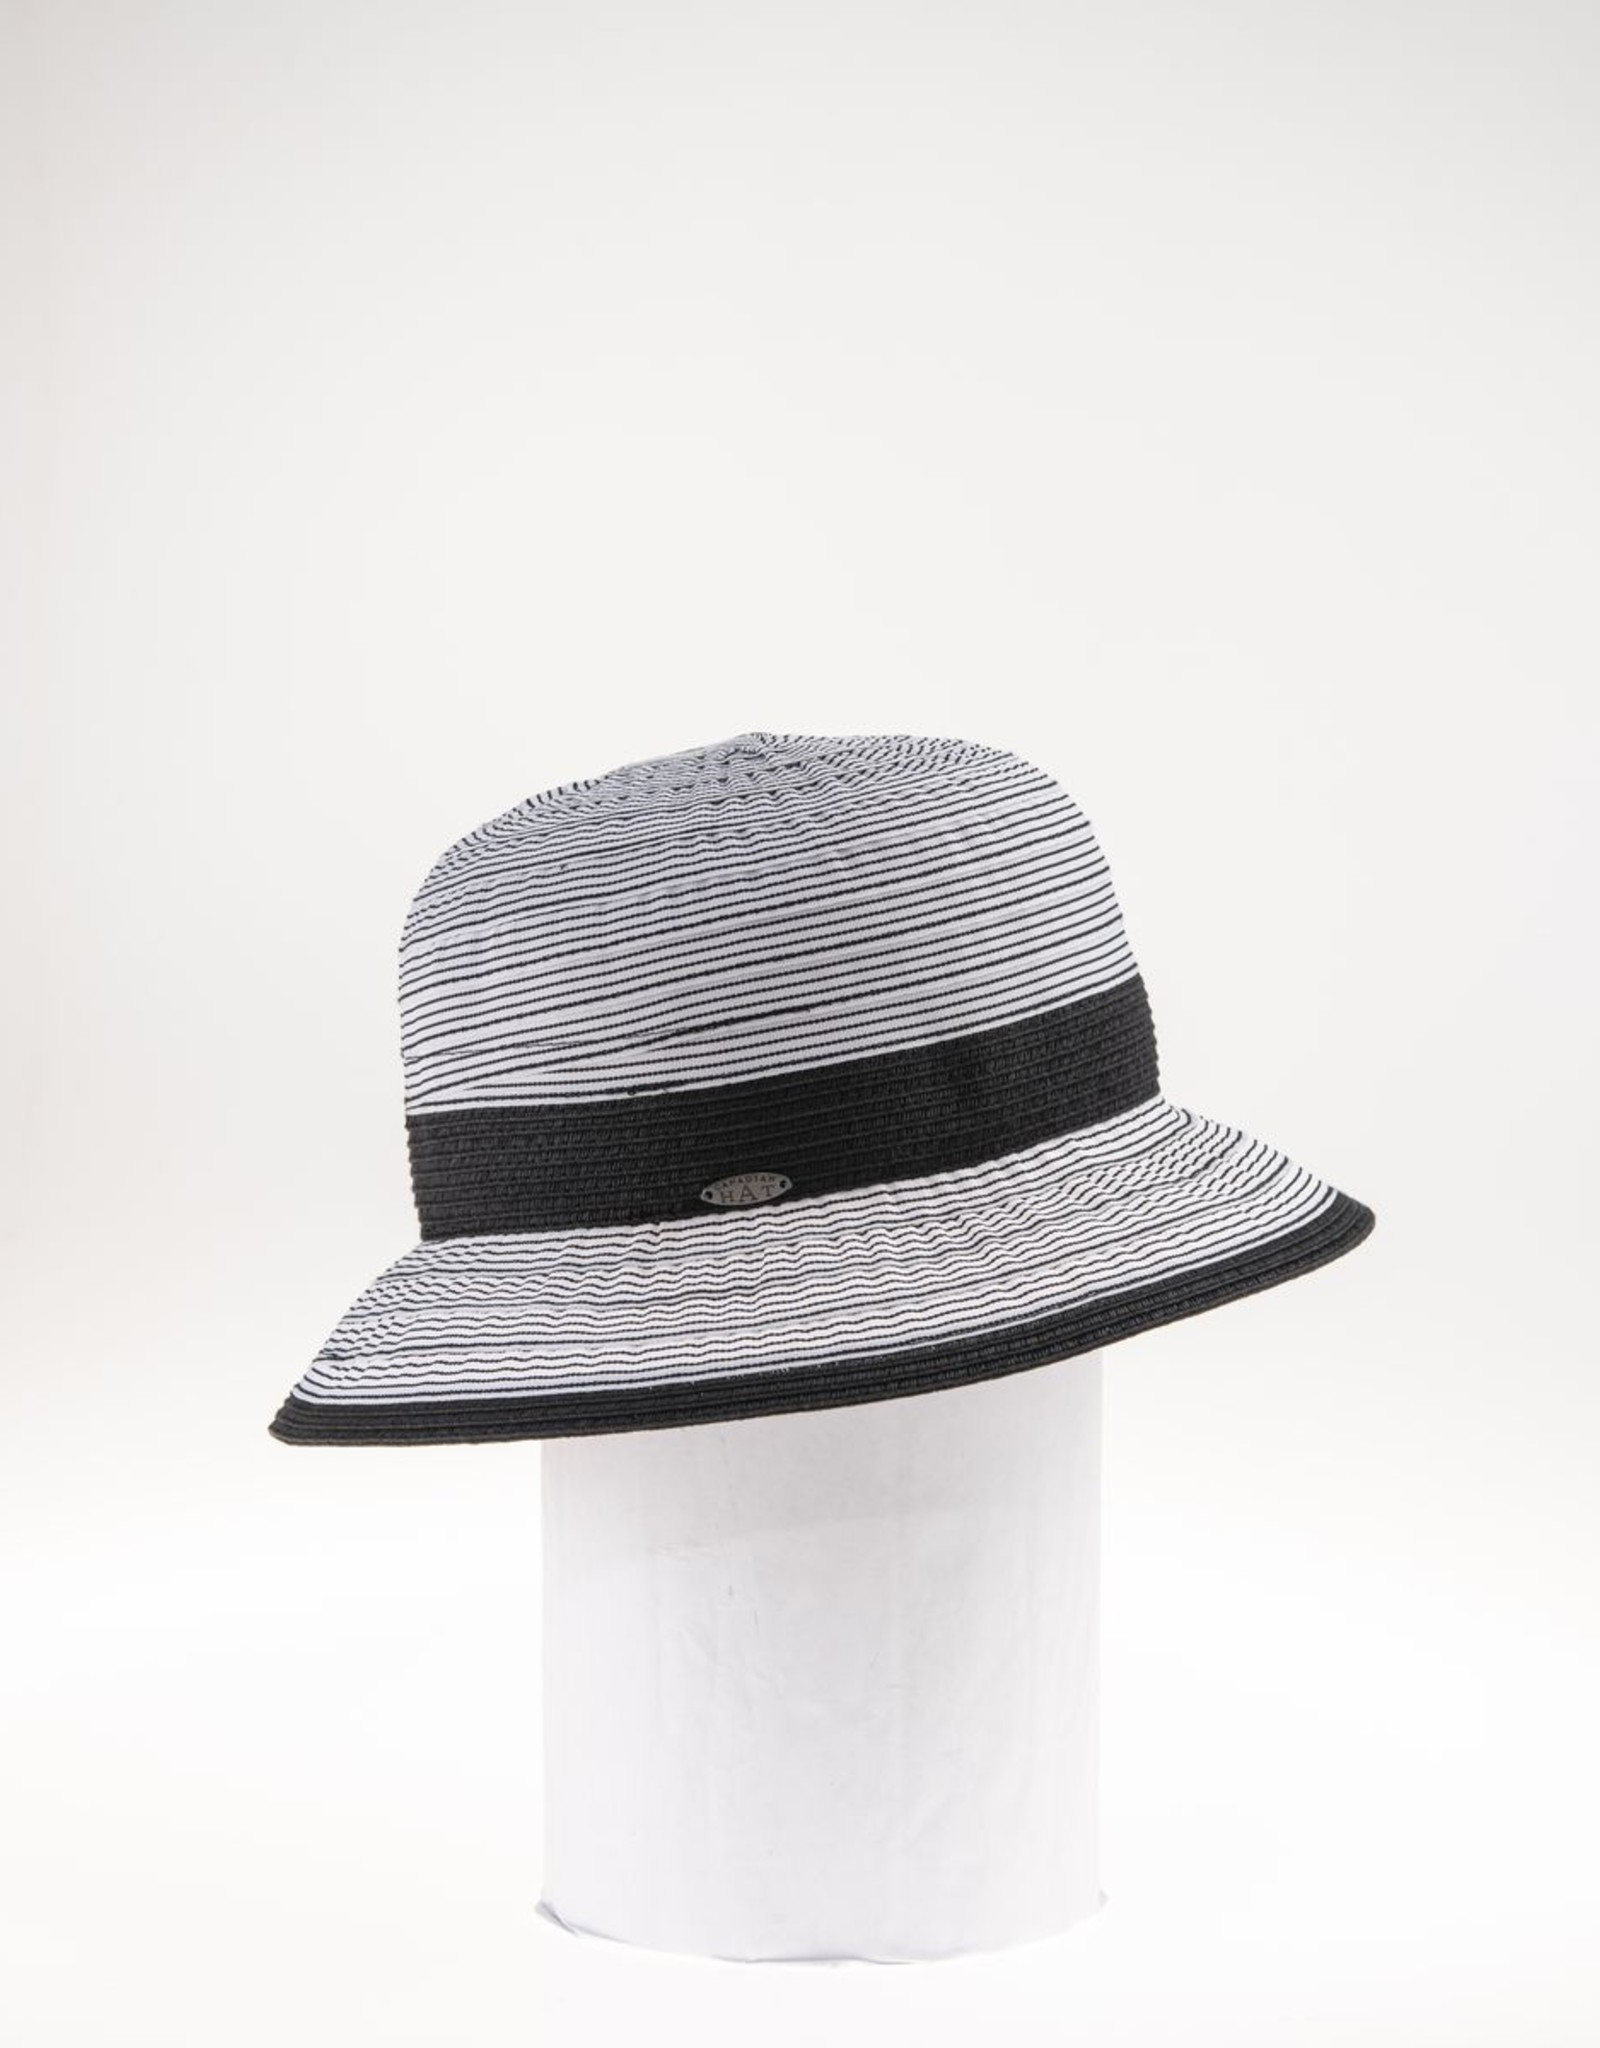 Canadian Hat Clairine cloche